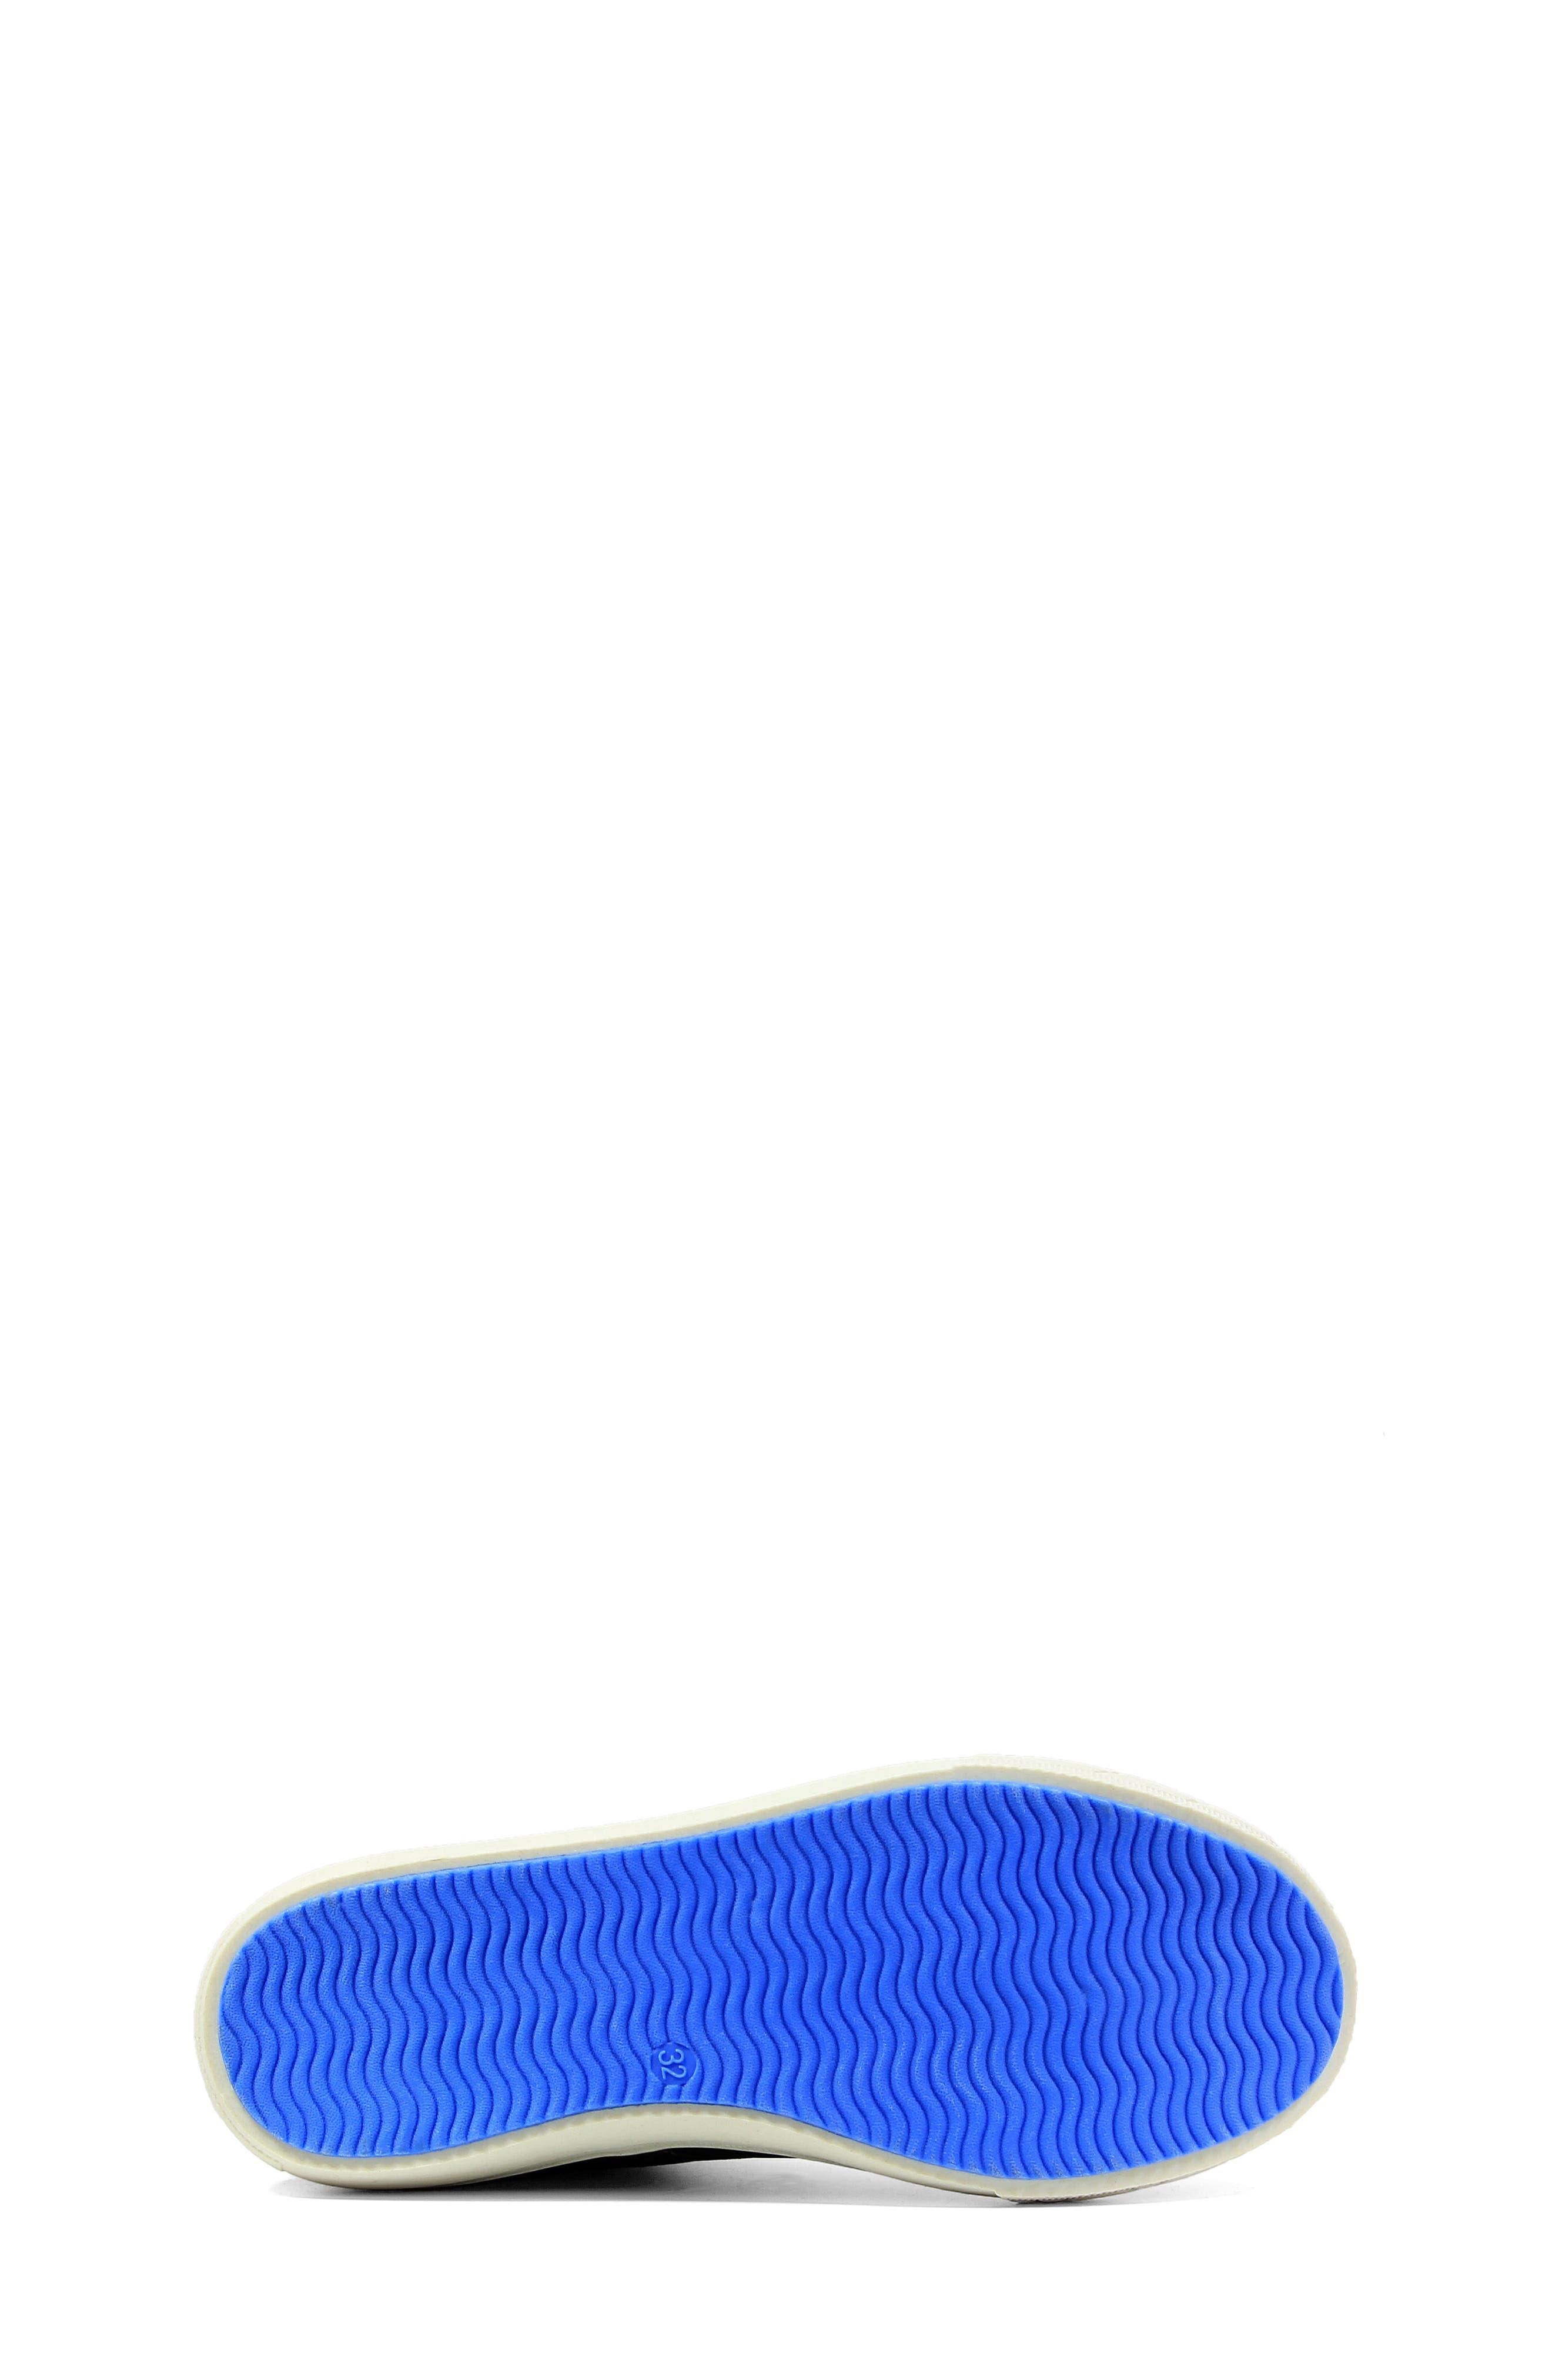 FLORSHEIM, Curb Chukka Sneaker Boot, Alternate thumbnail 5, color, 001